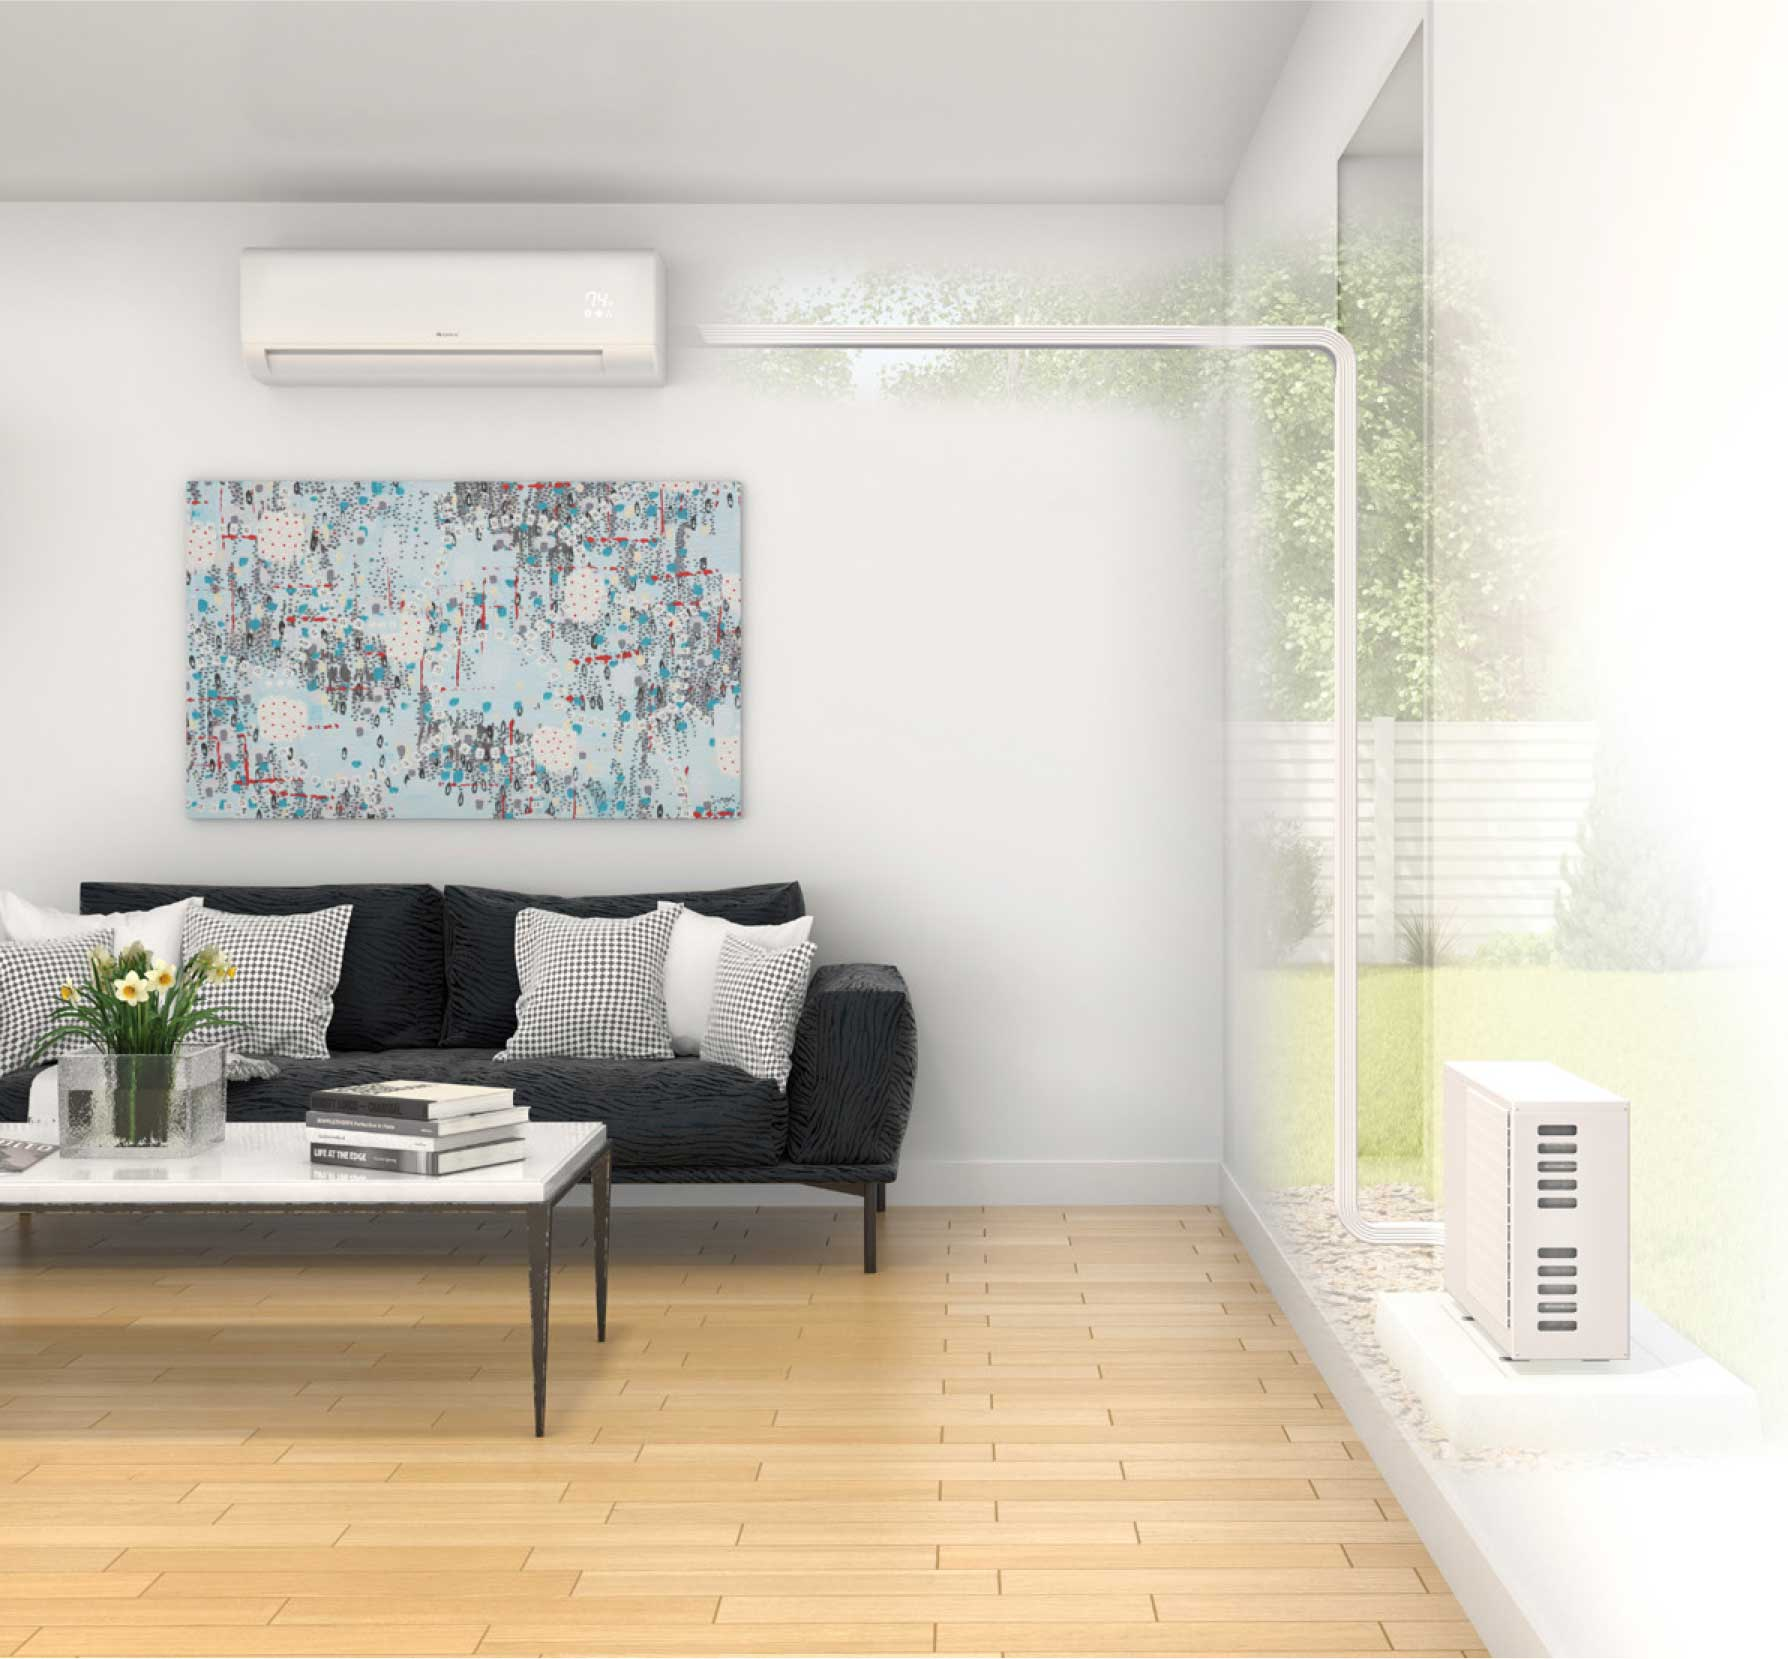 room with mini-split